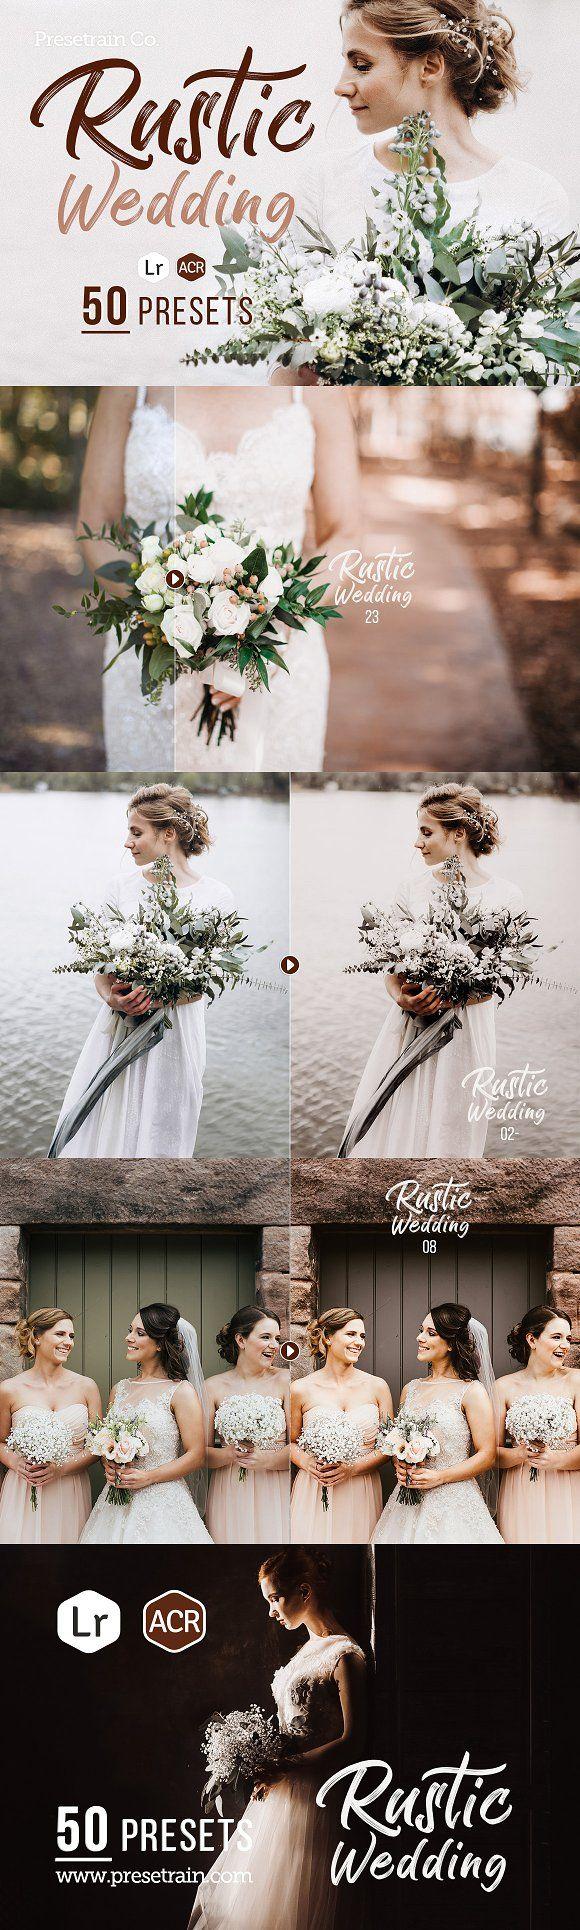 50 Rustic Wedding Adobe Lightroom presets with soft, rosy, vintage style. Perfec…